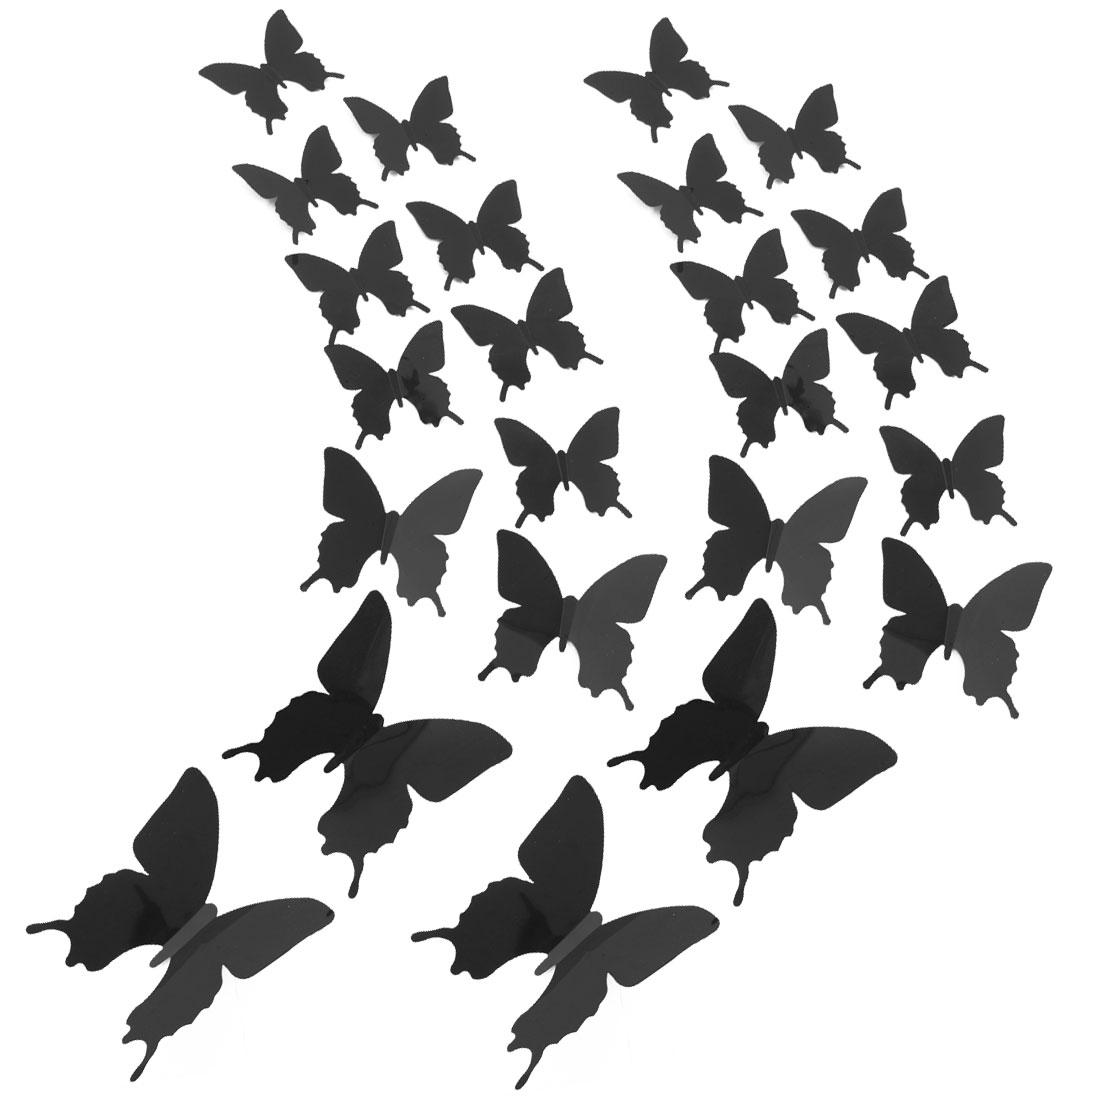 24pcs 3D Butterfly DIY Wall Sticker with Art Decals Sticker for Decor Black